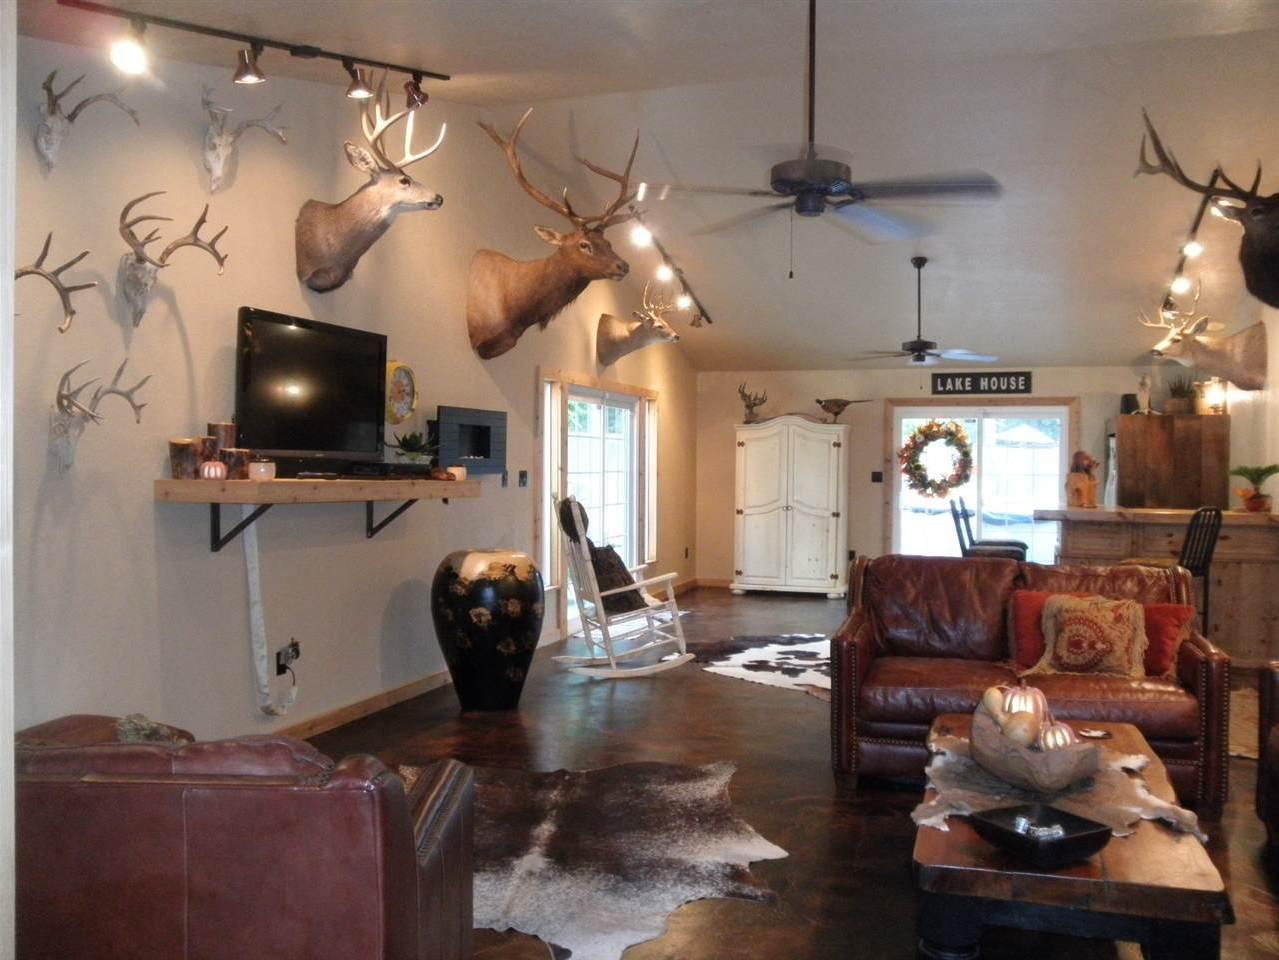 Sold Cross Sale W/ MLS | 54 Pike Lane  Ponca City, OK 74604 17